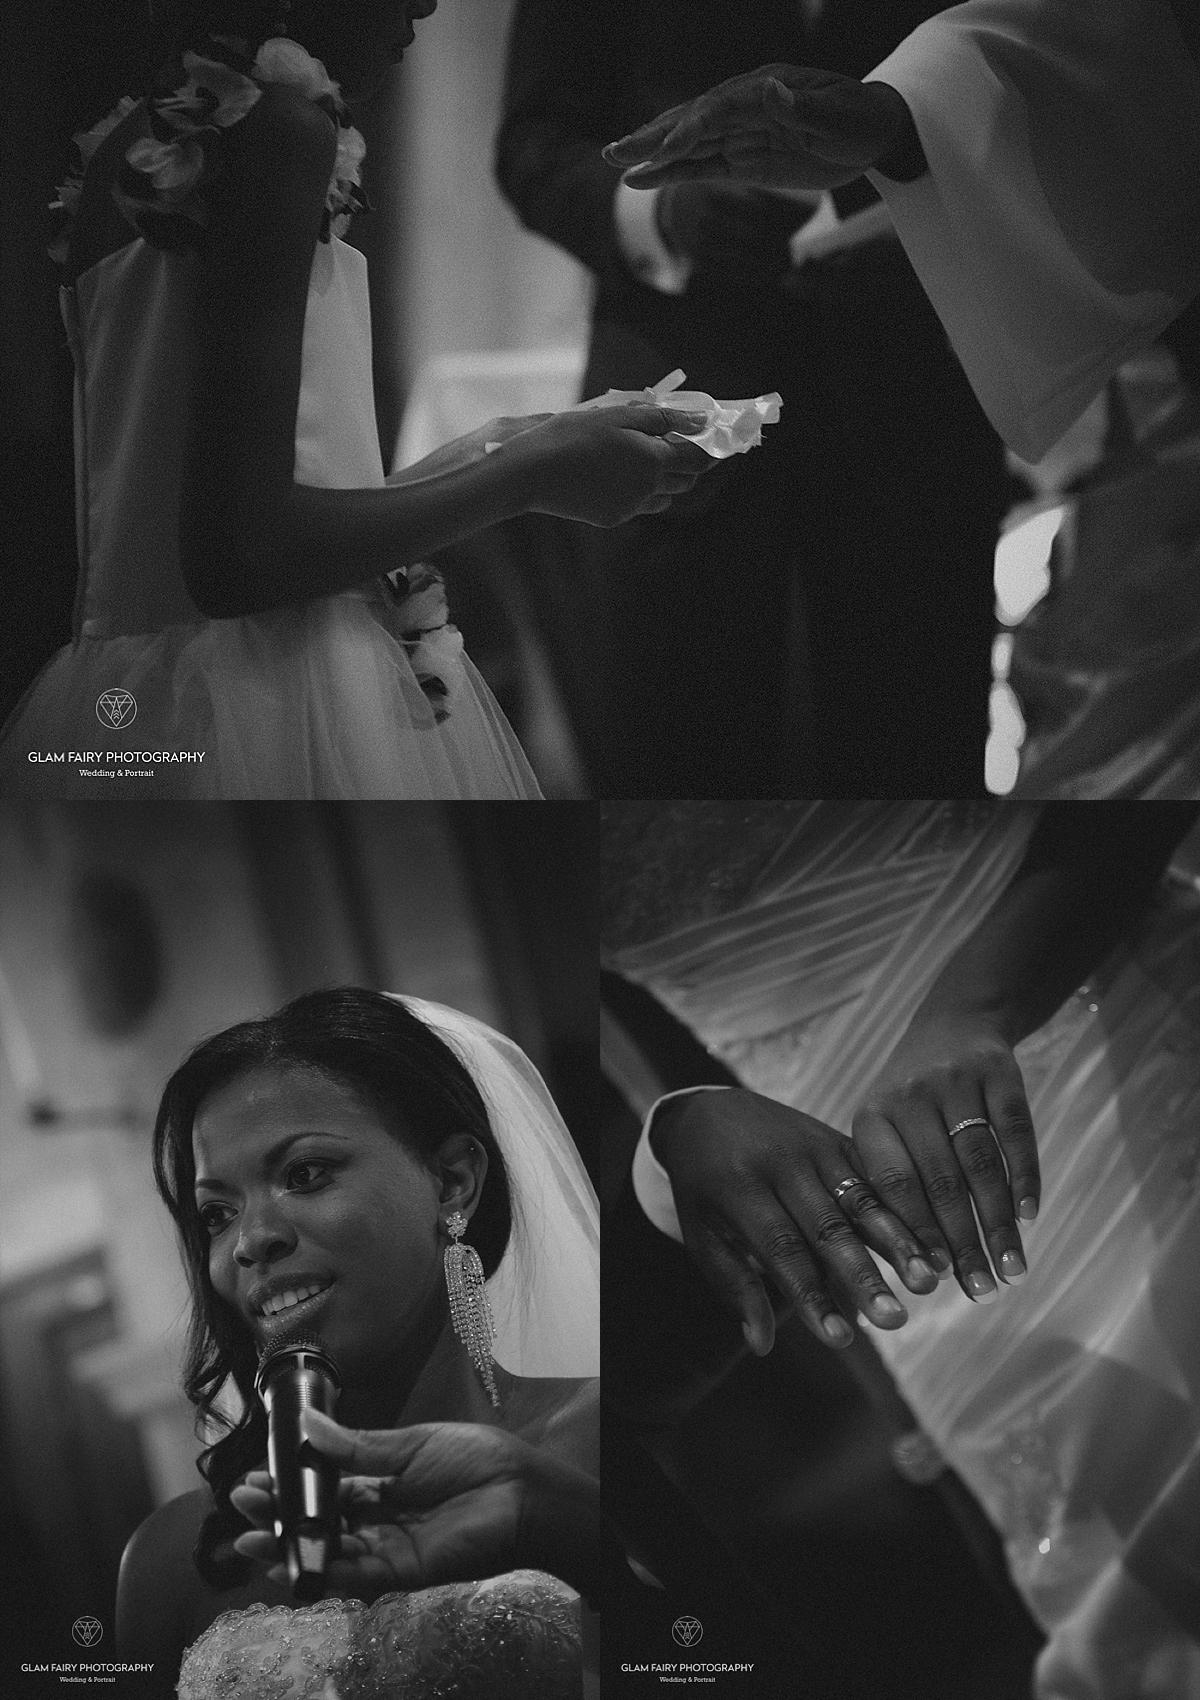 GlamFairyPhotography-mariage-afro-antillais-orsay-candy_0013